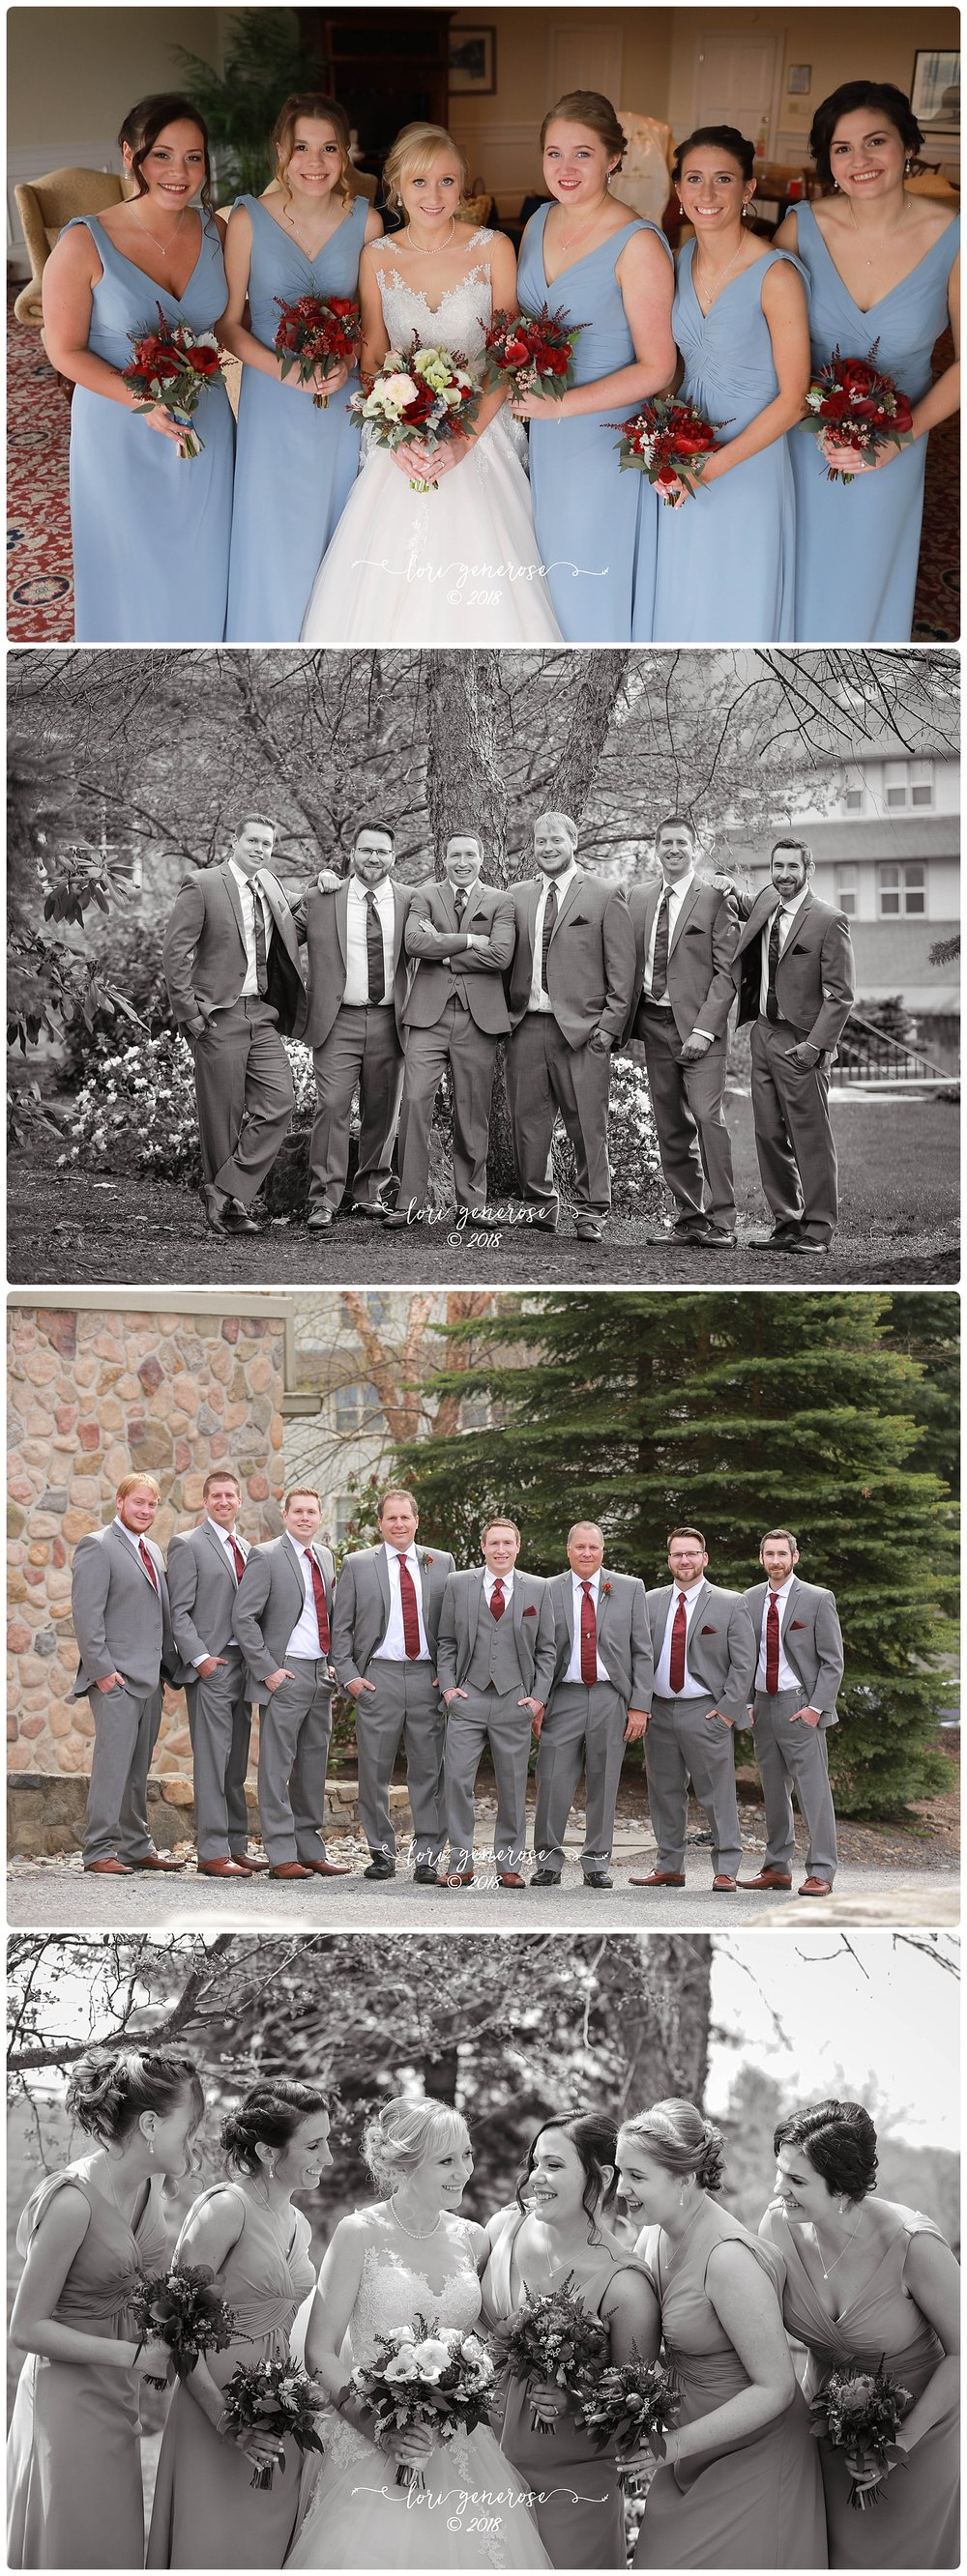 lgphotographylorigenerosetheinnatpoconomanorpaweddingvenuebridesmaidsgroomsmen.jpg